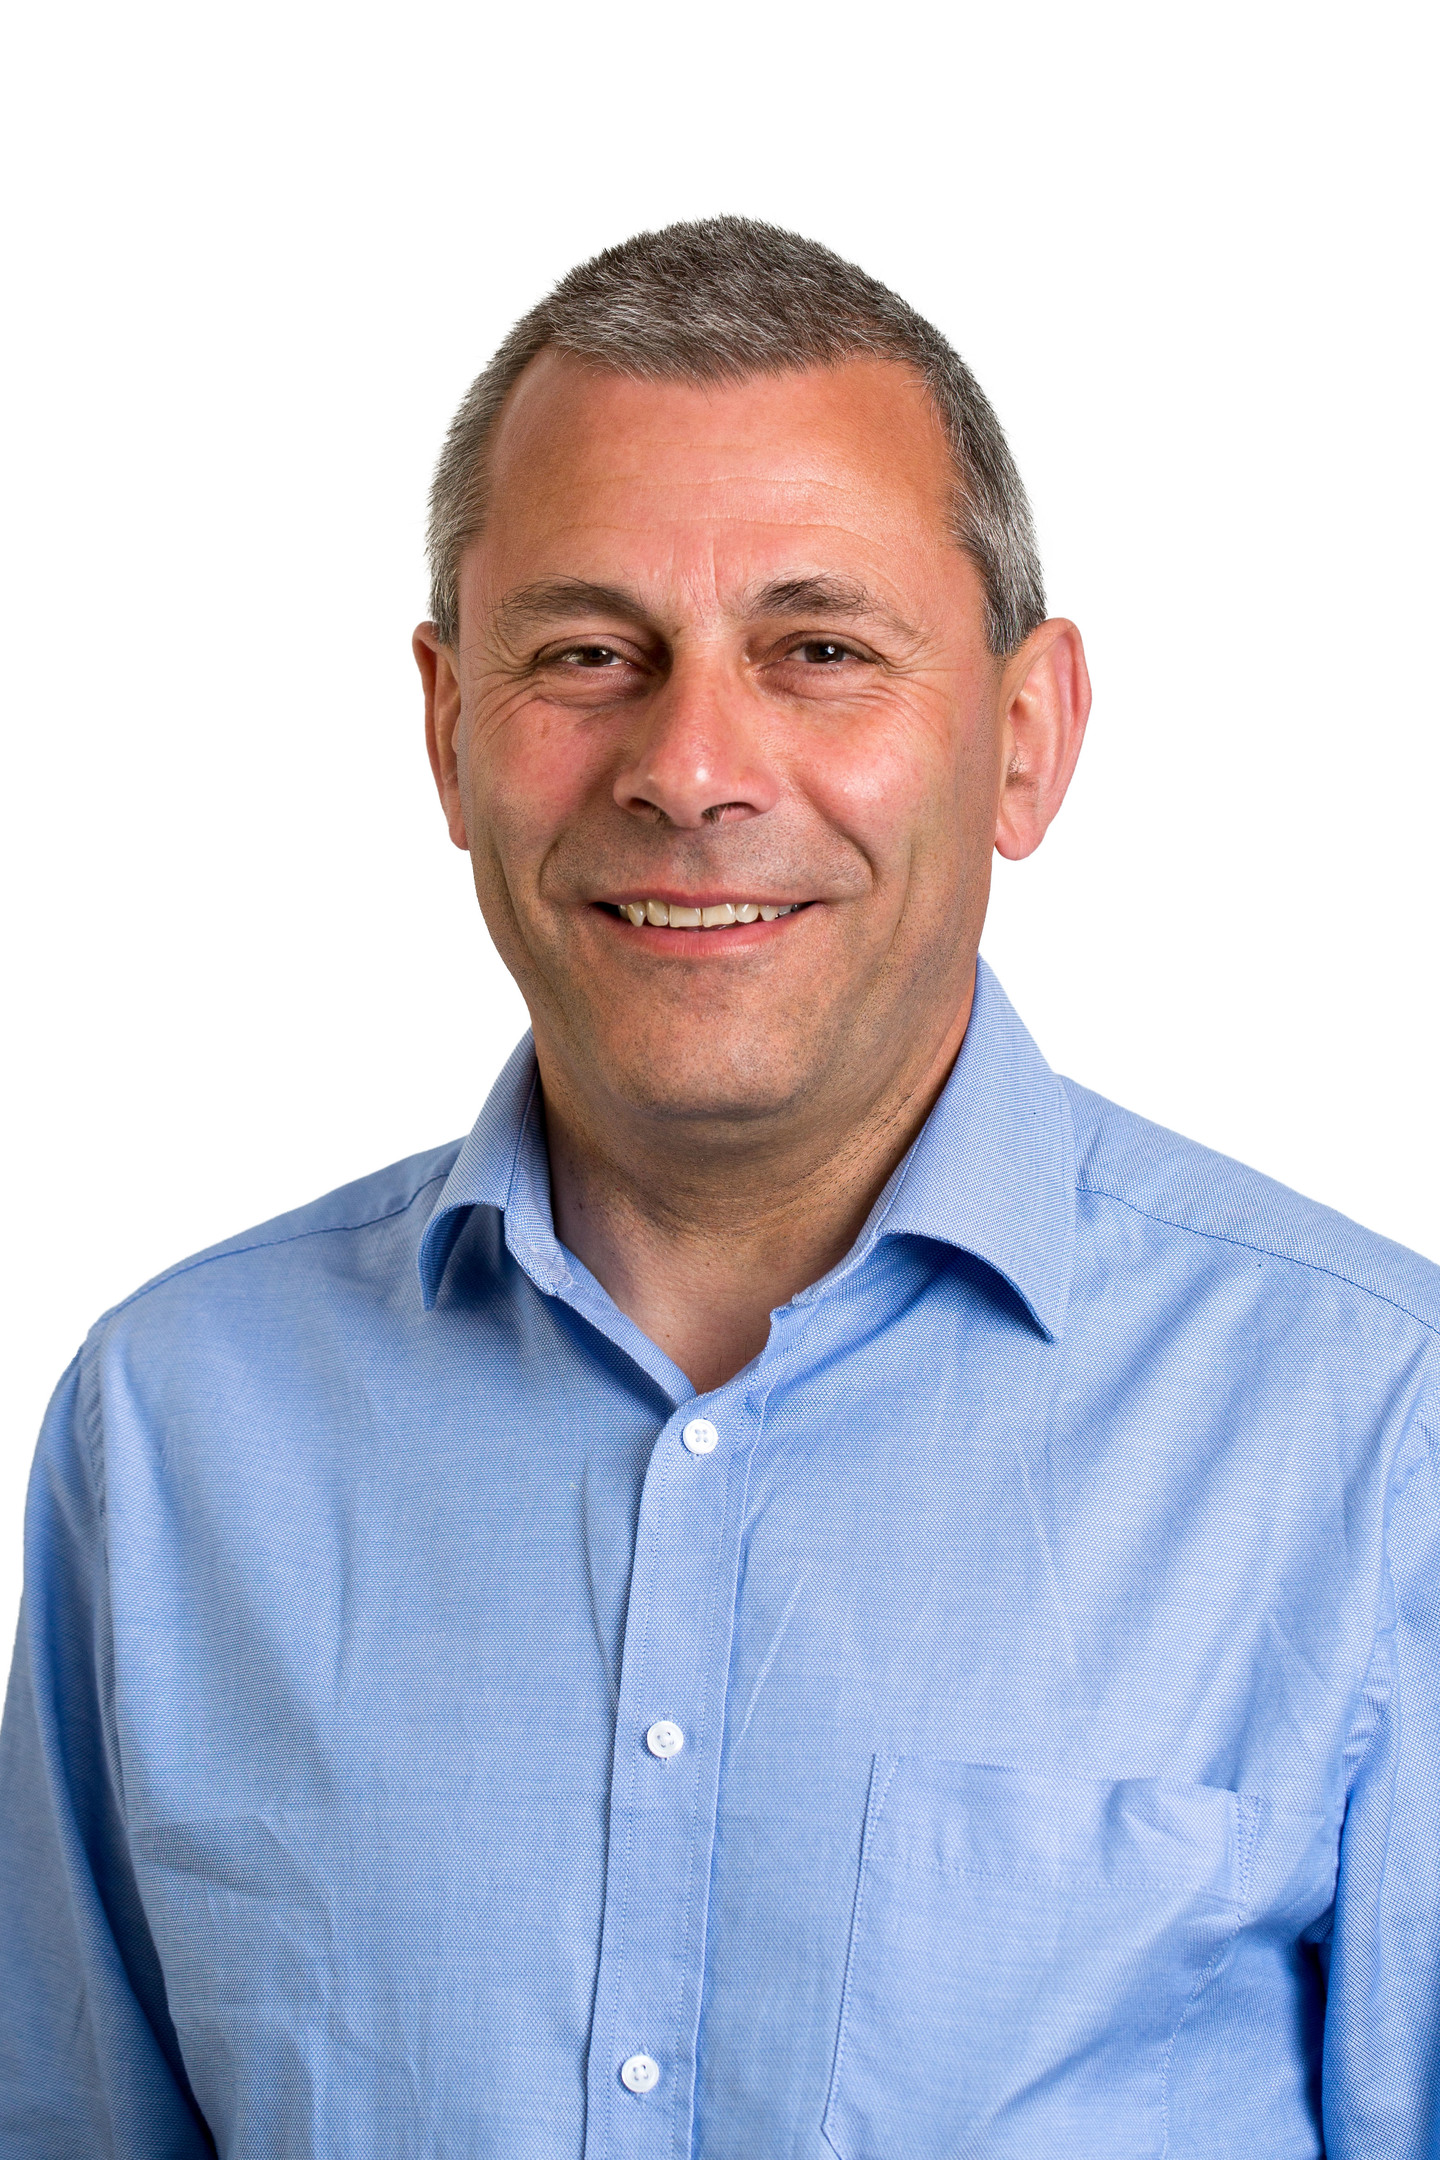 Bill Cattanach, head of supply chain, OGA